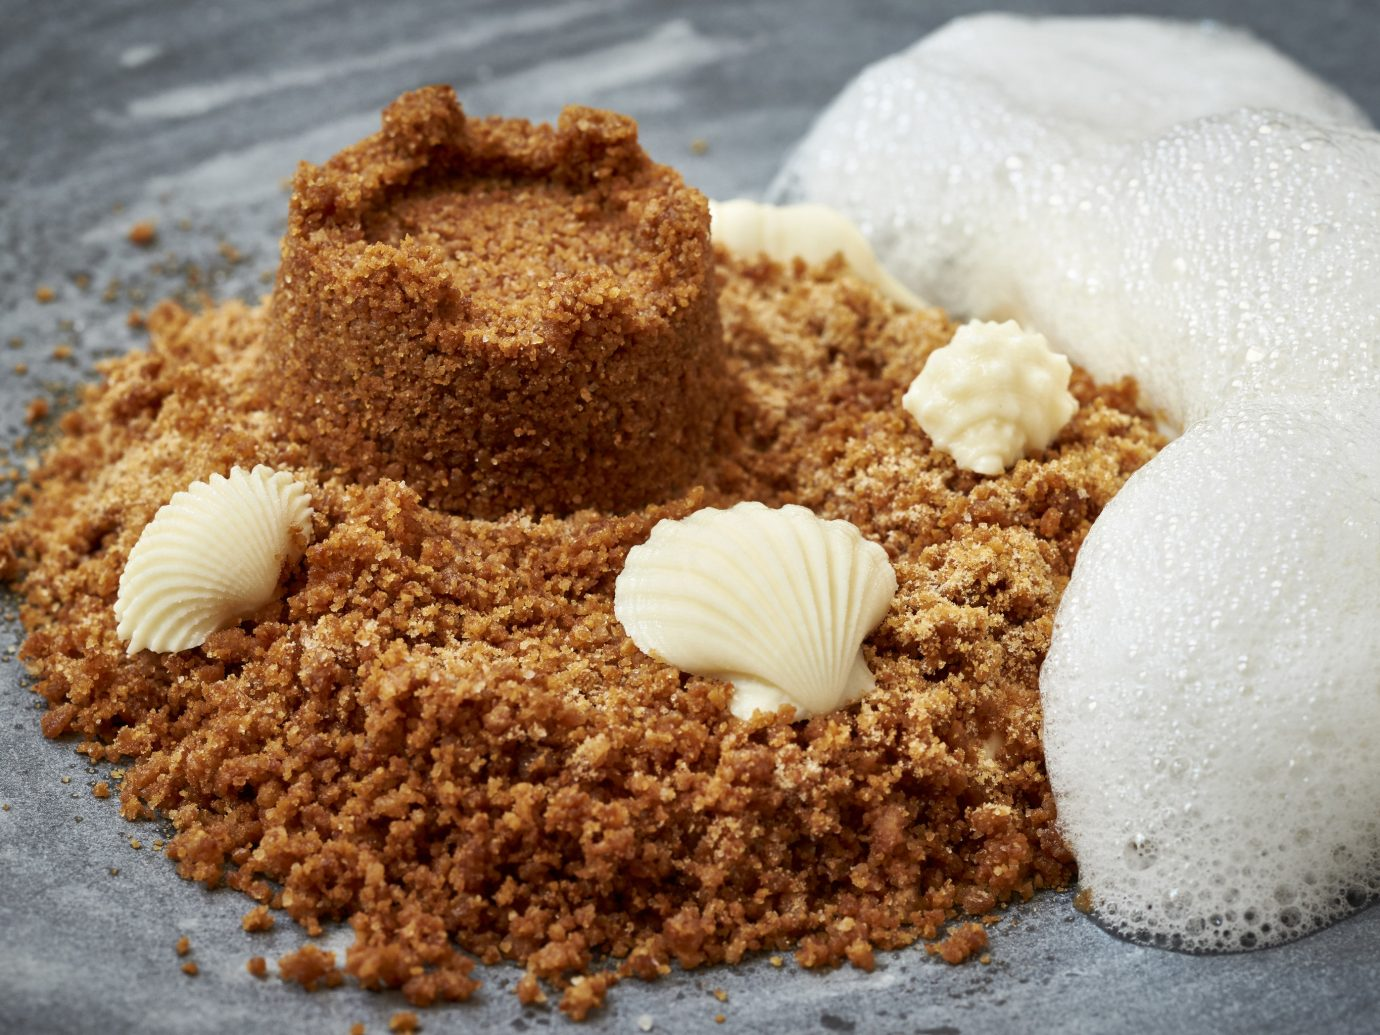 Trip Ideas cake food piece dish dessert cream coconut chocolate baking produce breakfast ice baked goods flavor cuisine decorated